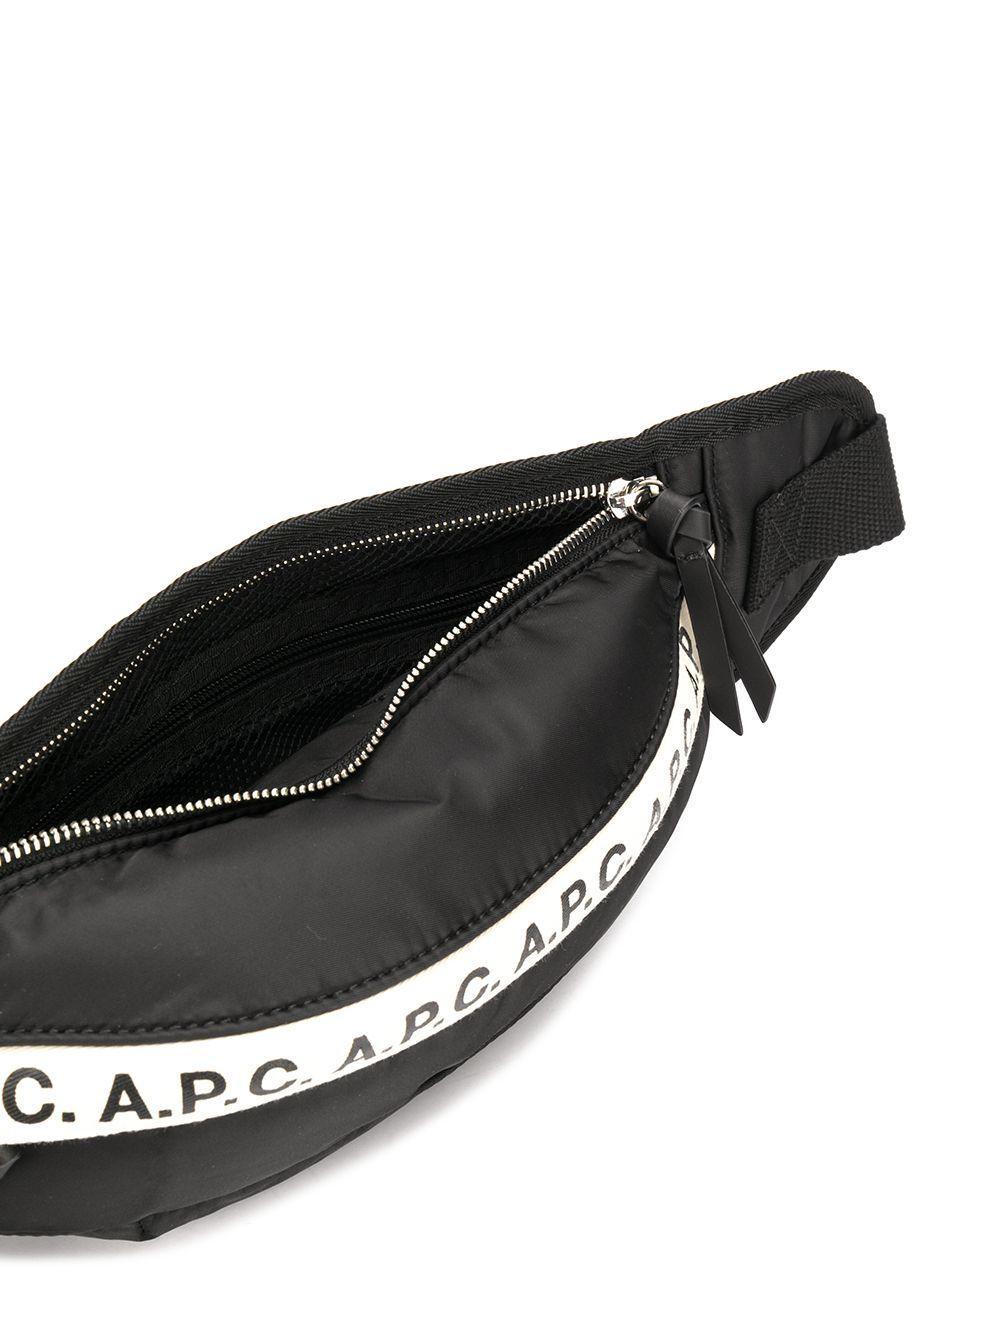 A.P.C. MEN'S PAACLH62141LZZ BLACK POLYAMIDE BELT BAG